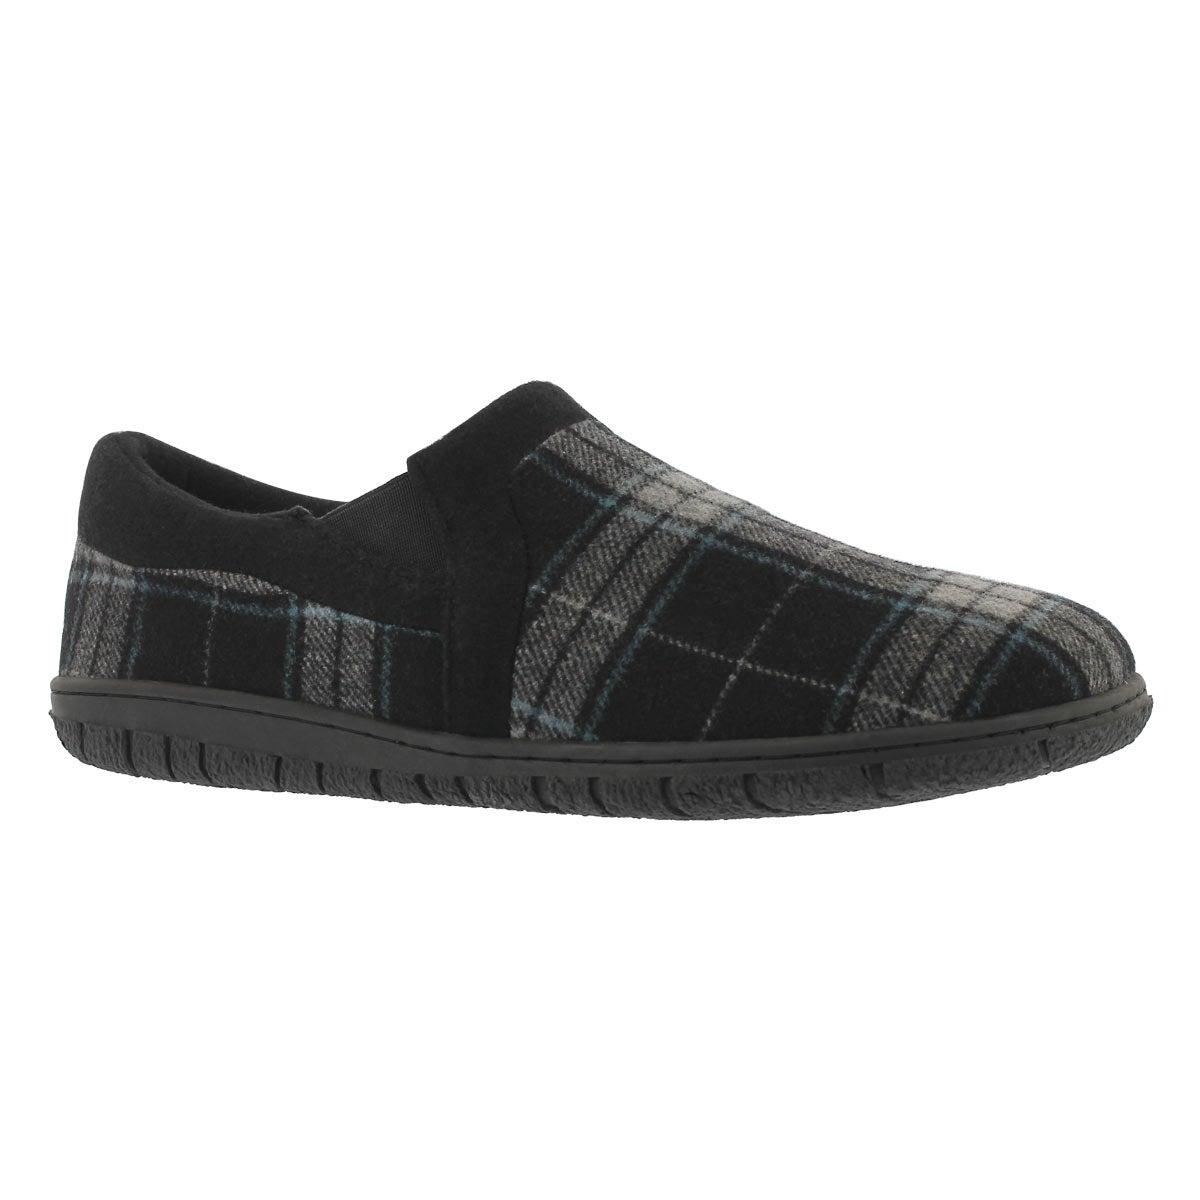 Men's JACOB black plaid memory foam slippers